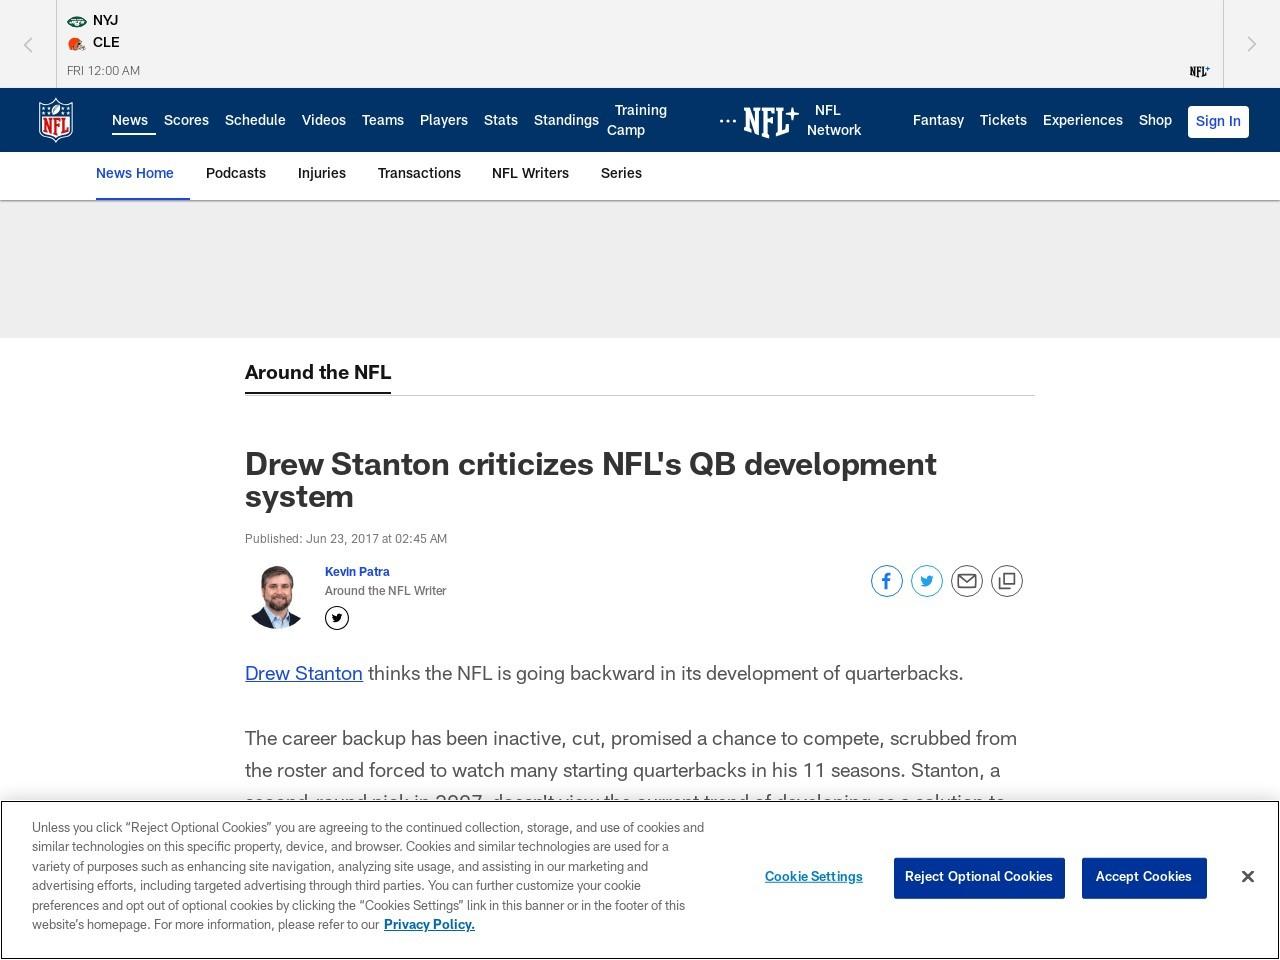 Drew Stanton criticizes NFL's QB development system